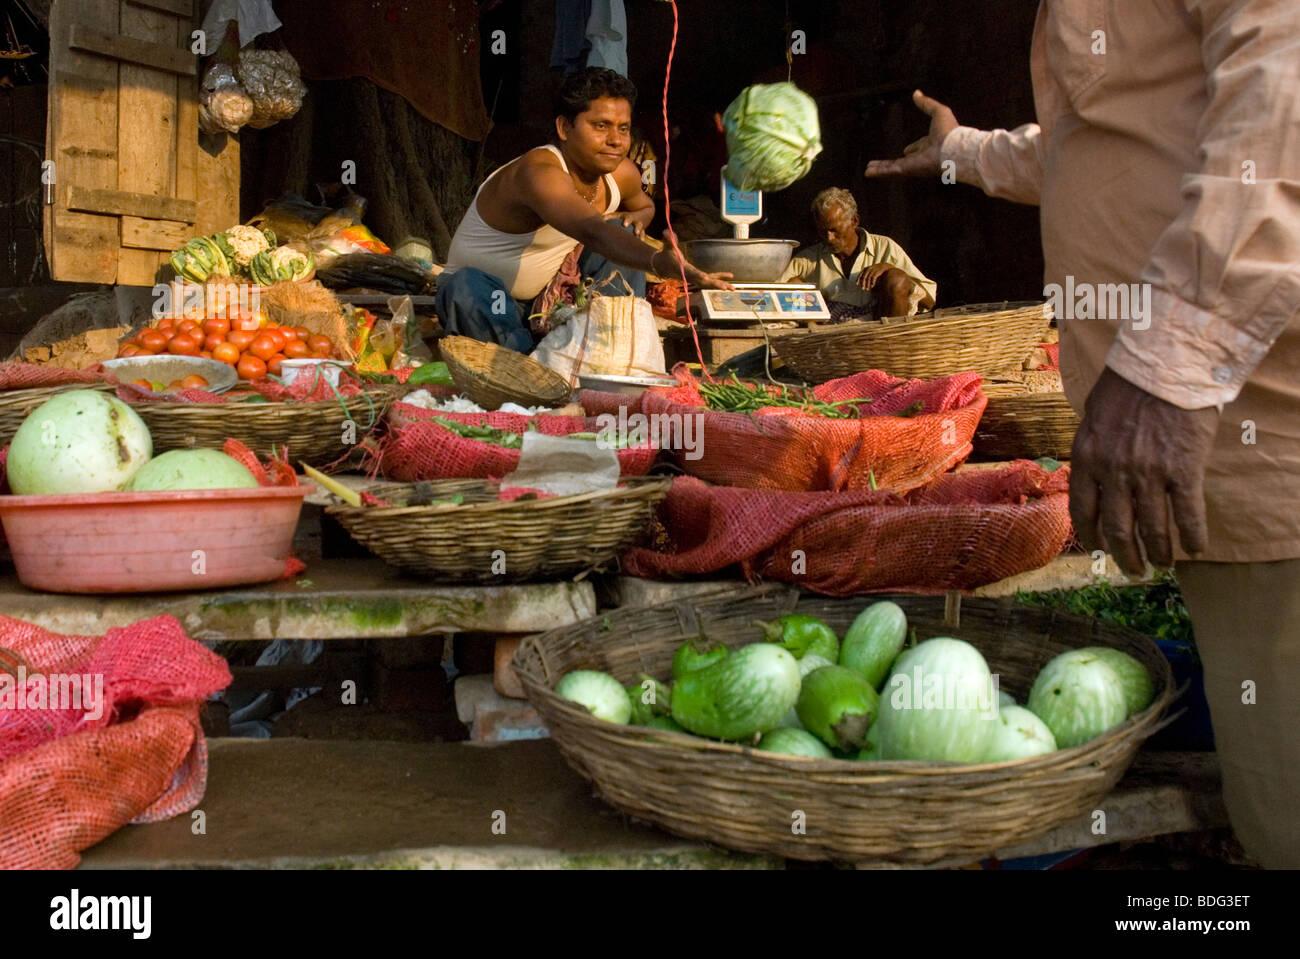 Tienda de ultramarinos en Bhubaneswar, Orissa, India. Foto de stock